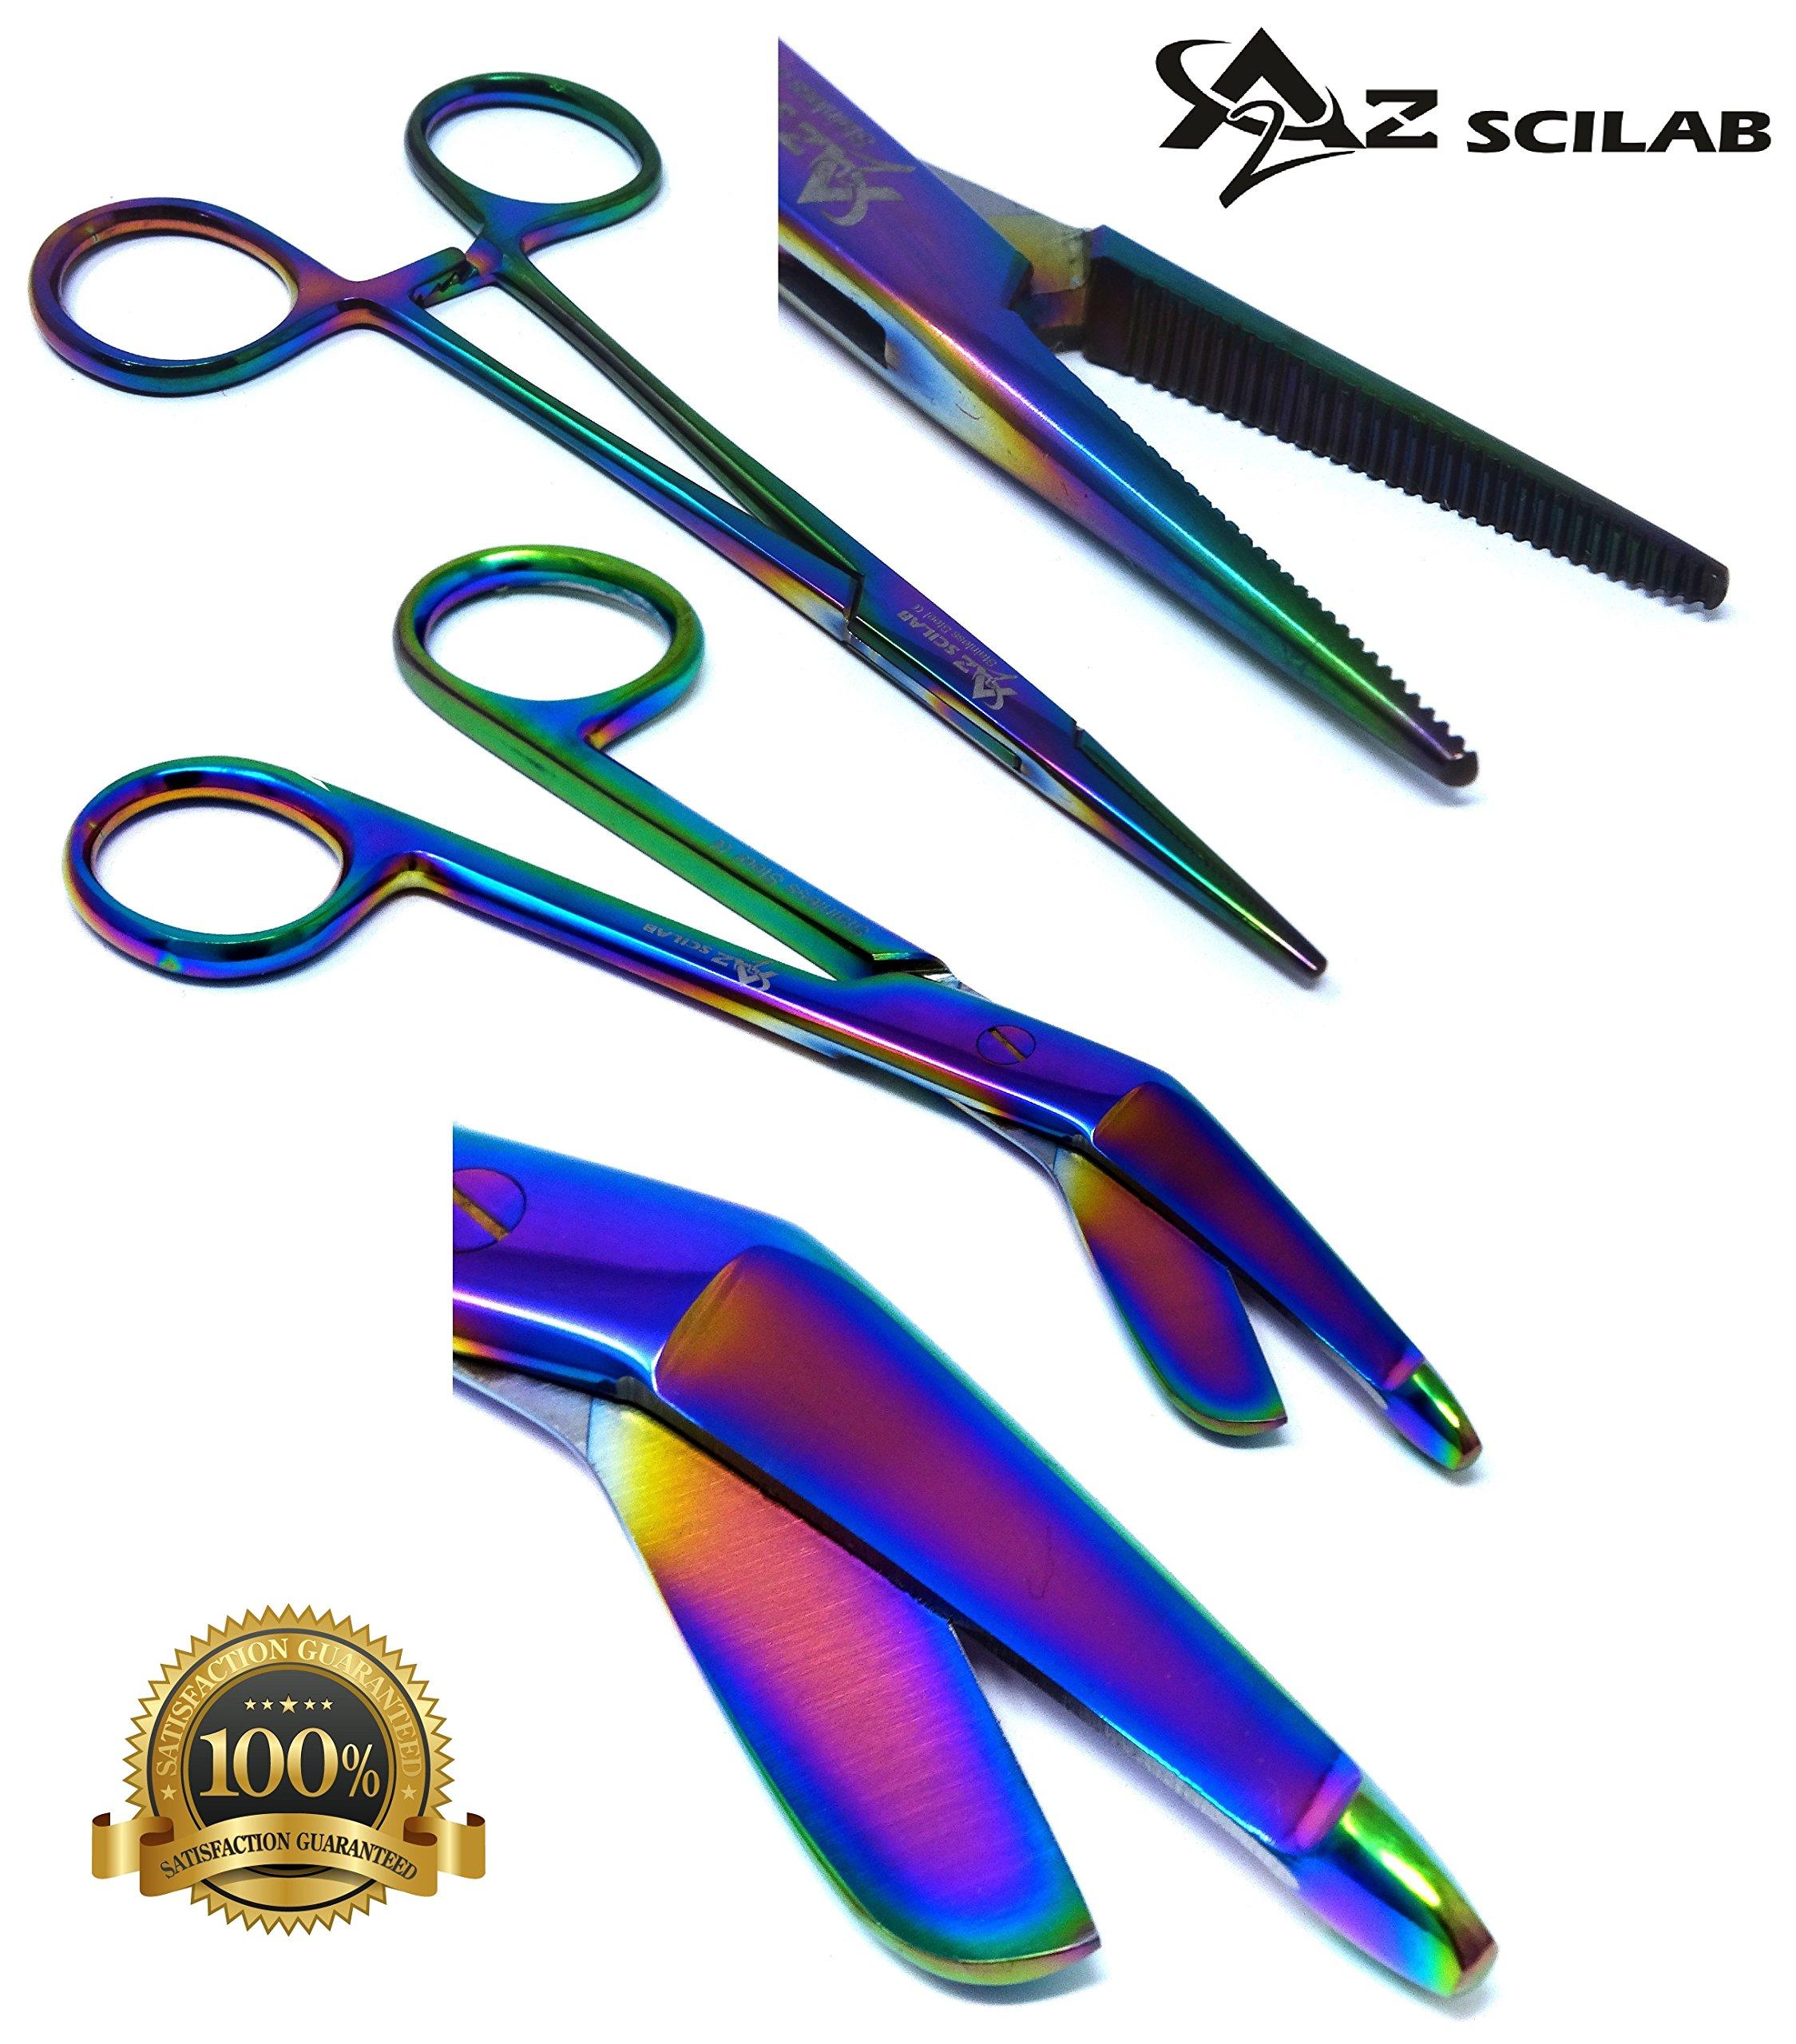 Heavy Duty Multi Rainbow Color Lister Bandage Trauma Shears Scissors + Hemostat Forceps Straight PREMIUM QUALITY (A2ZSCILAB) (5.5'' Scissors + 5.5'' Straight Hemostat)